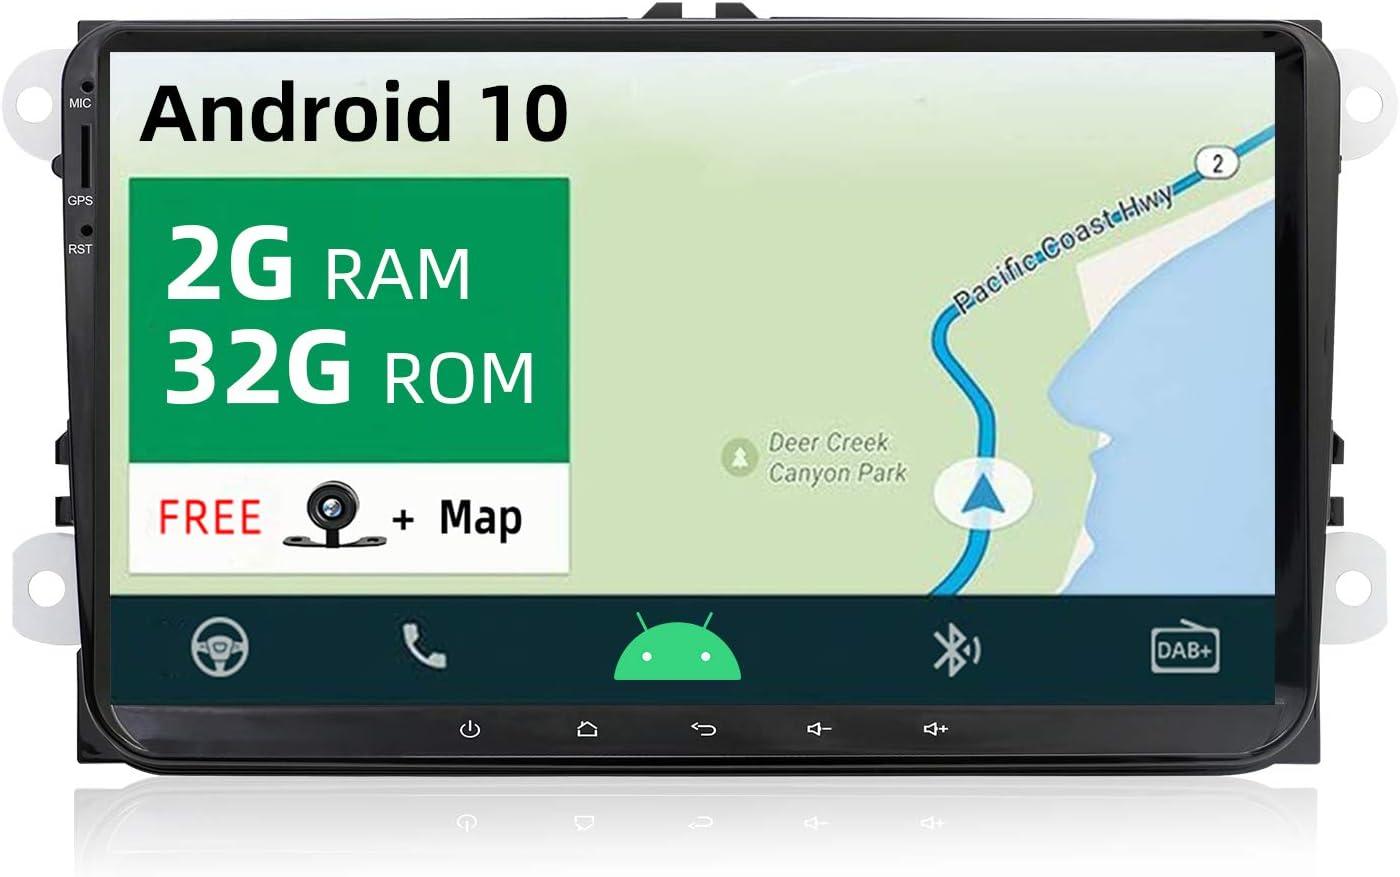 Yuntx Android 10 Autoradio Mit Navi Für Vw Golf Skoda Seat Gps 2 Din 9 Zoll Touchscreen Unterstützt Lenkrad Bedienung Bluetooth Dab Wifi 4g Carplay Usb Microsd Navigation